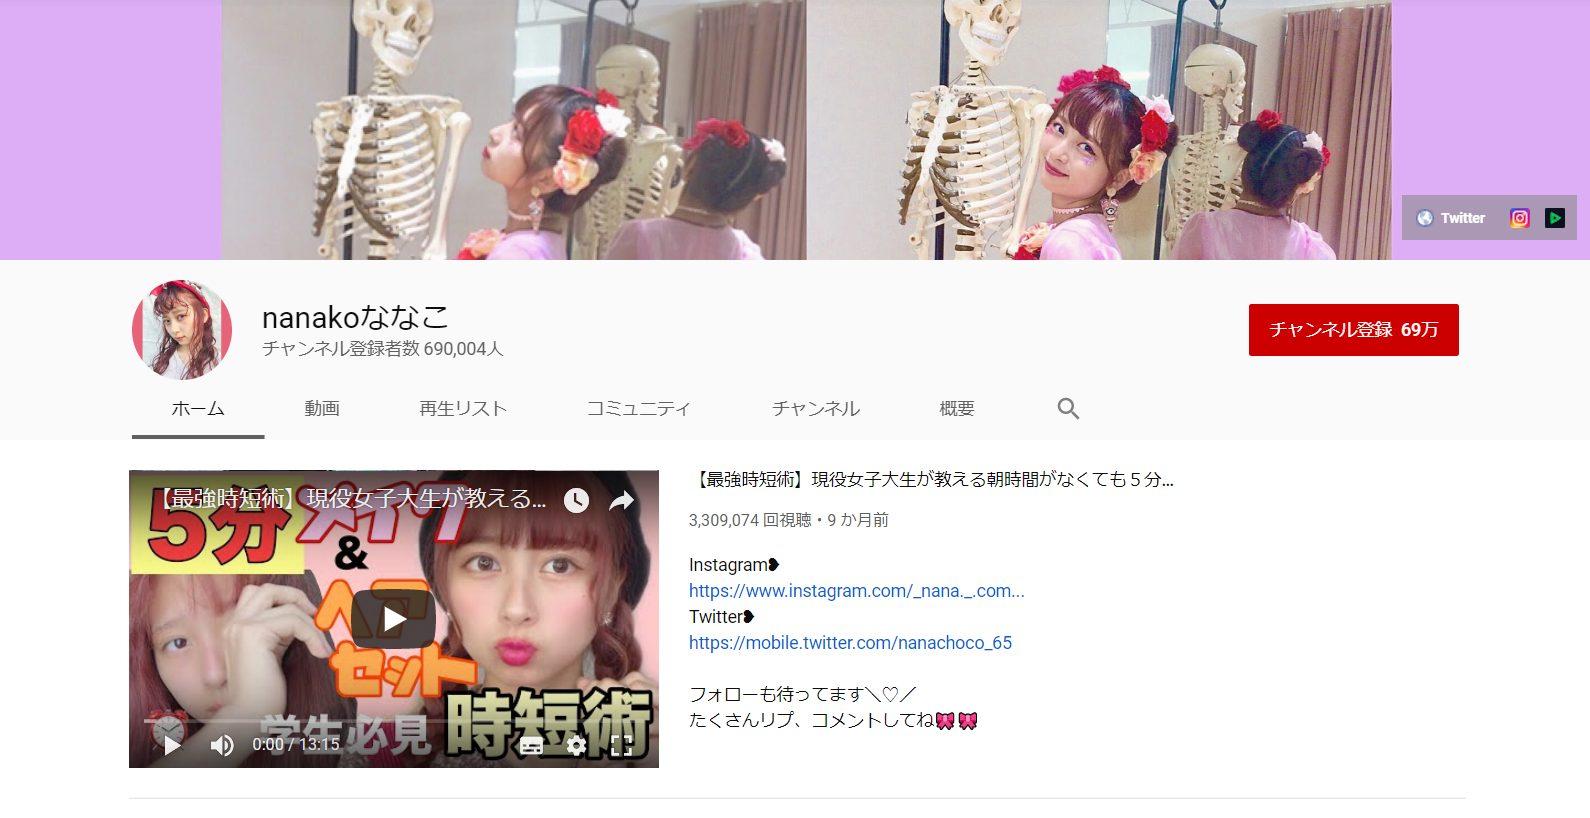 beauty-cosmetic-youtube-channel-nanako